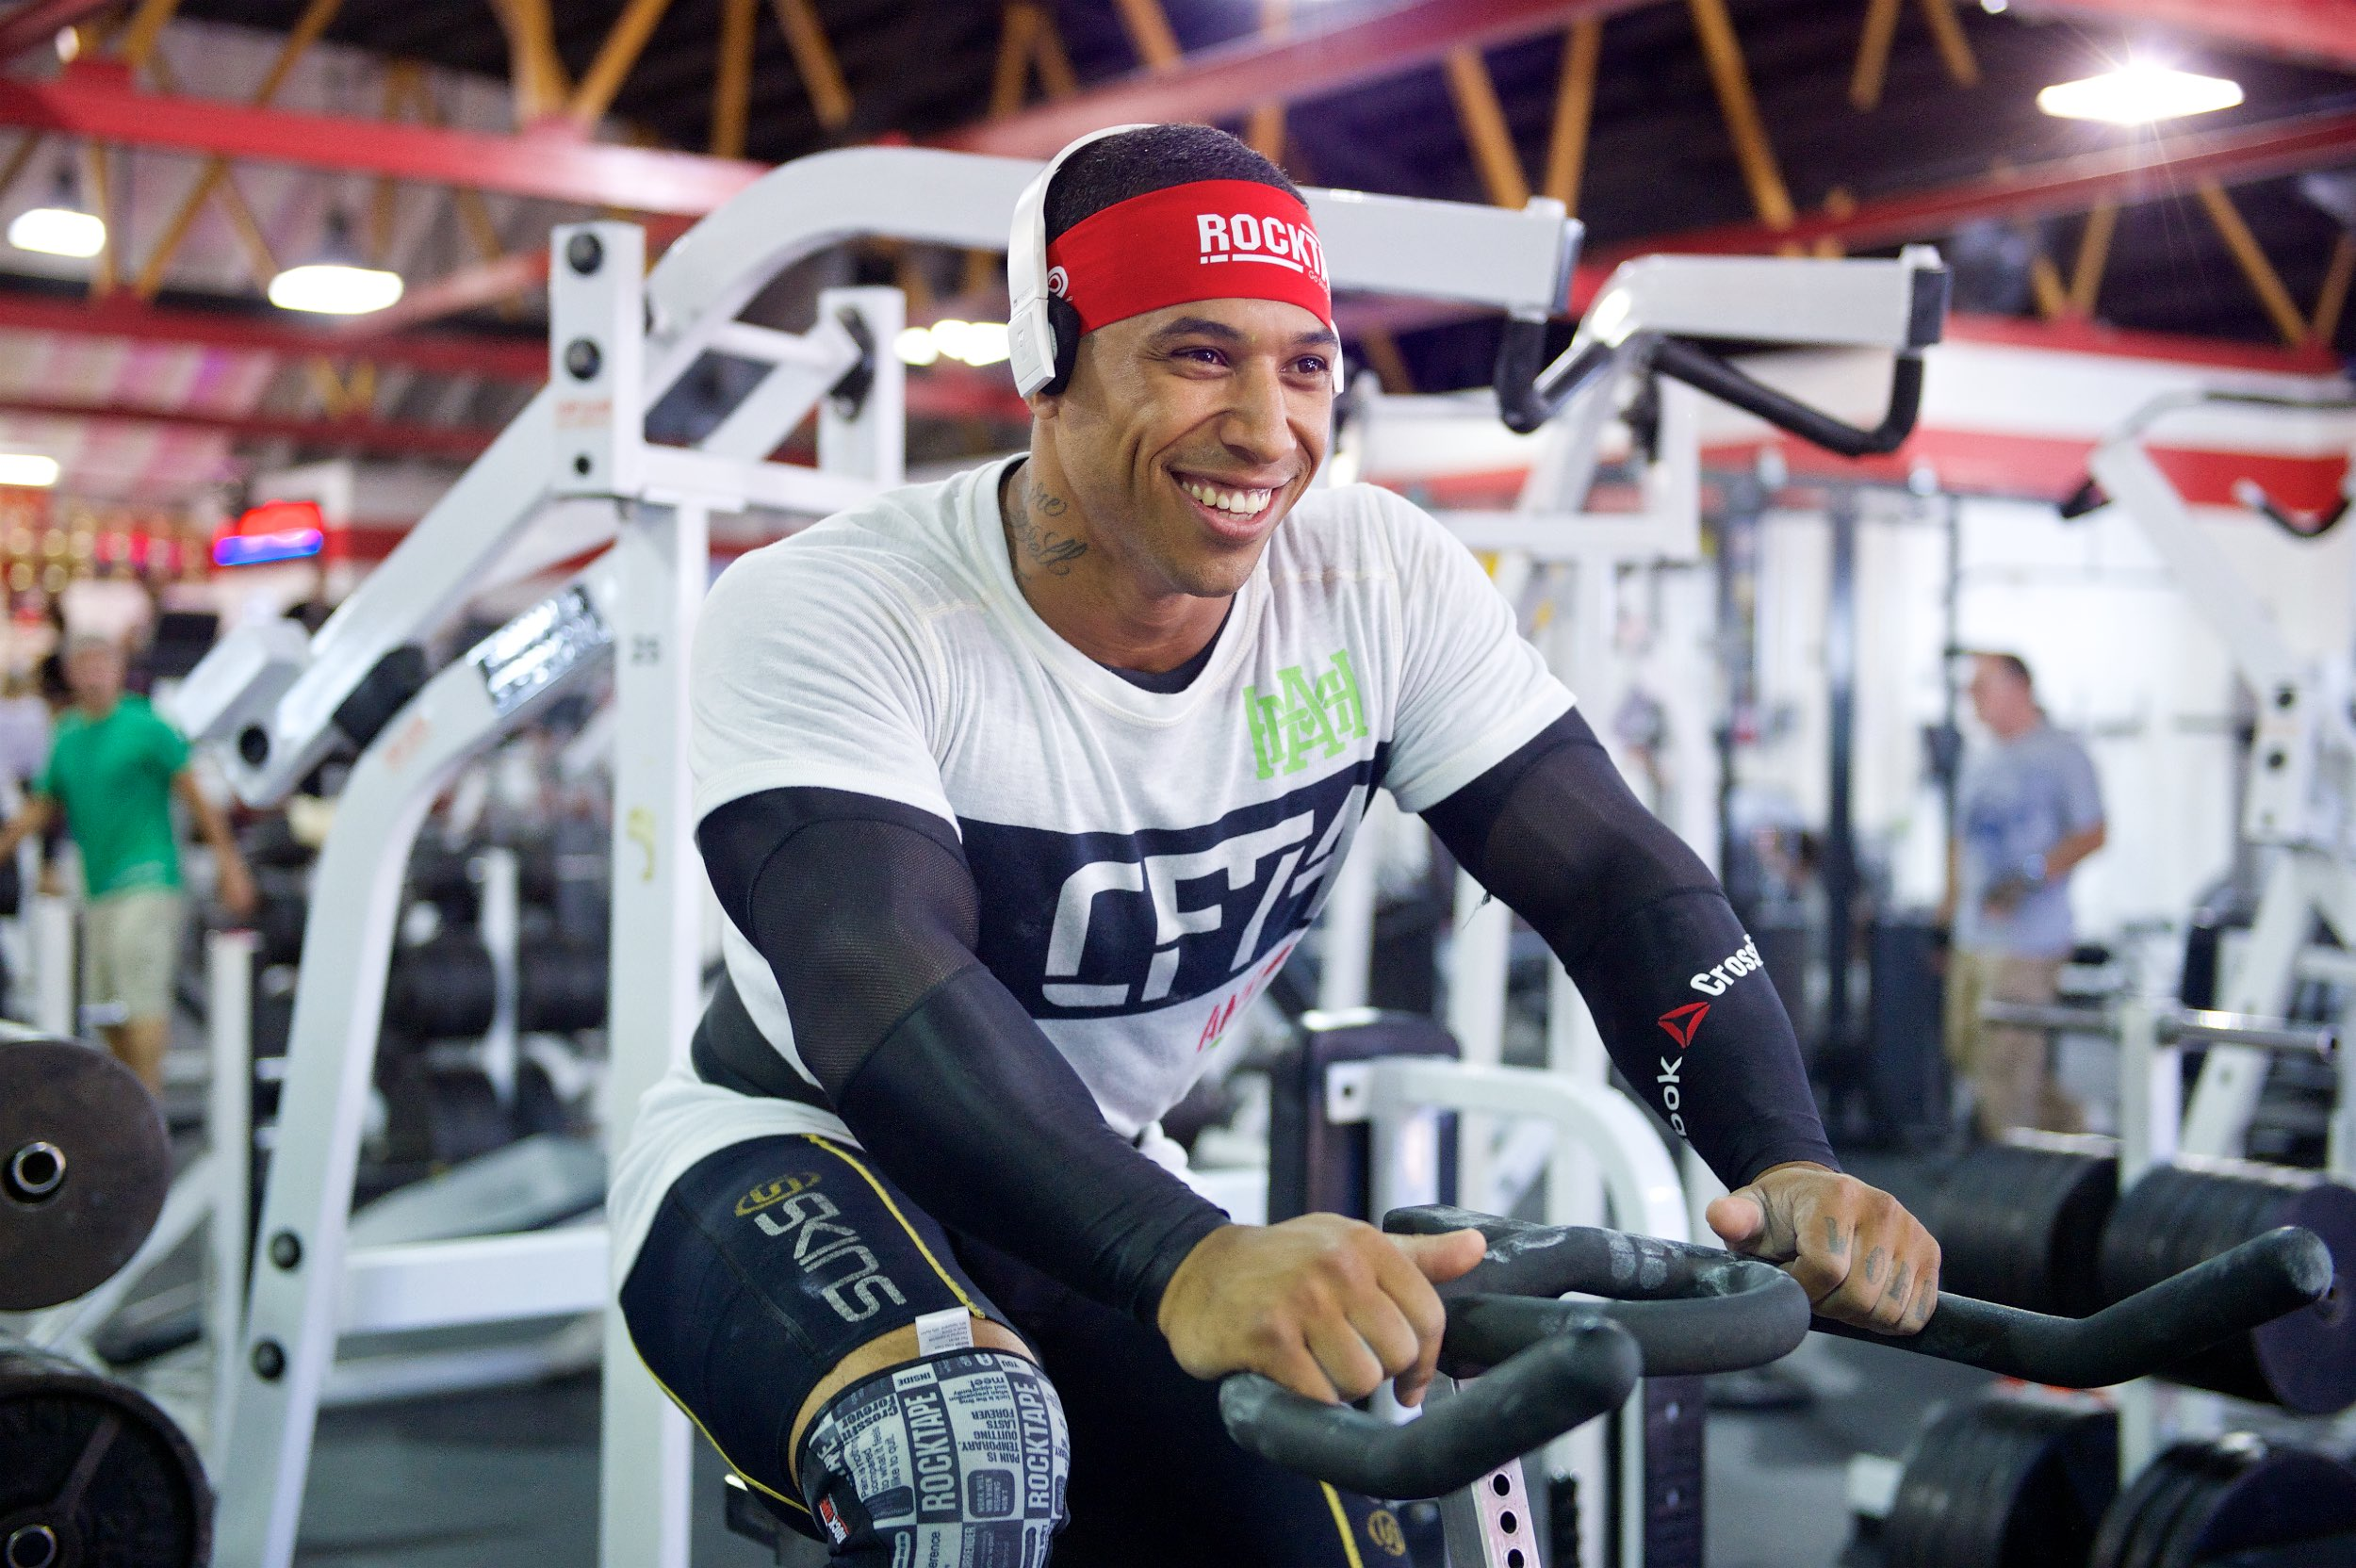 jacobeleah-fitness-001.jpg